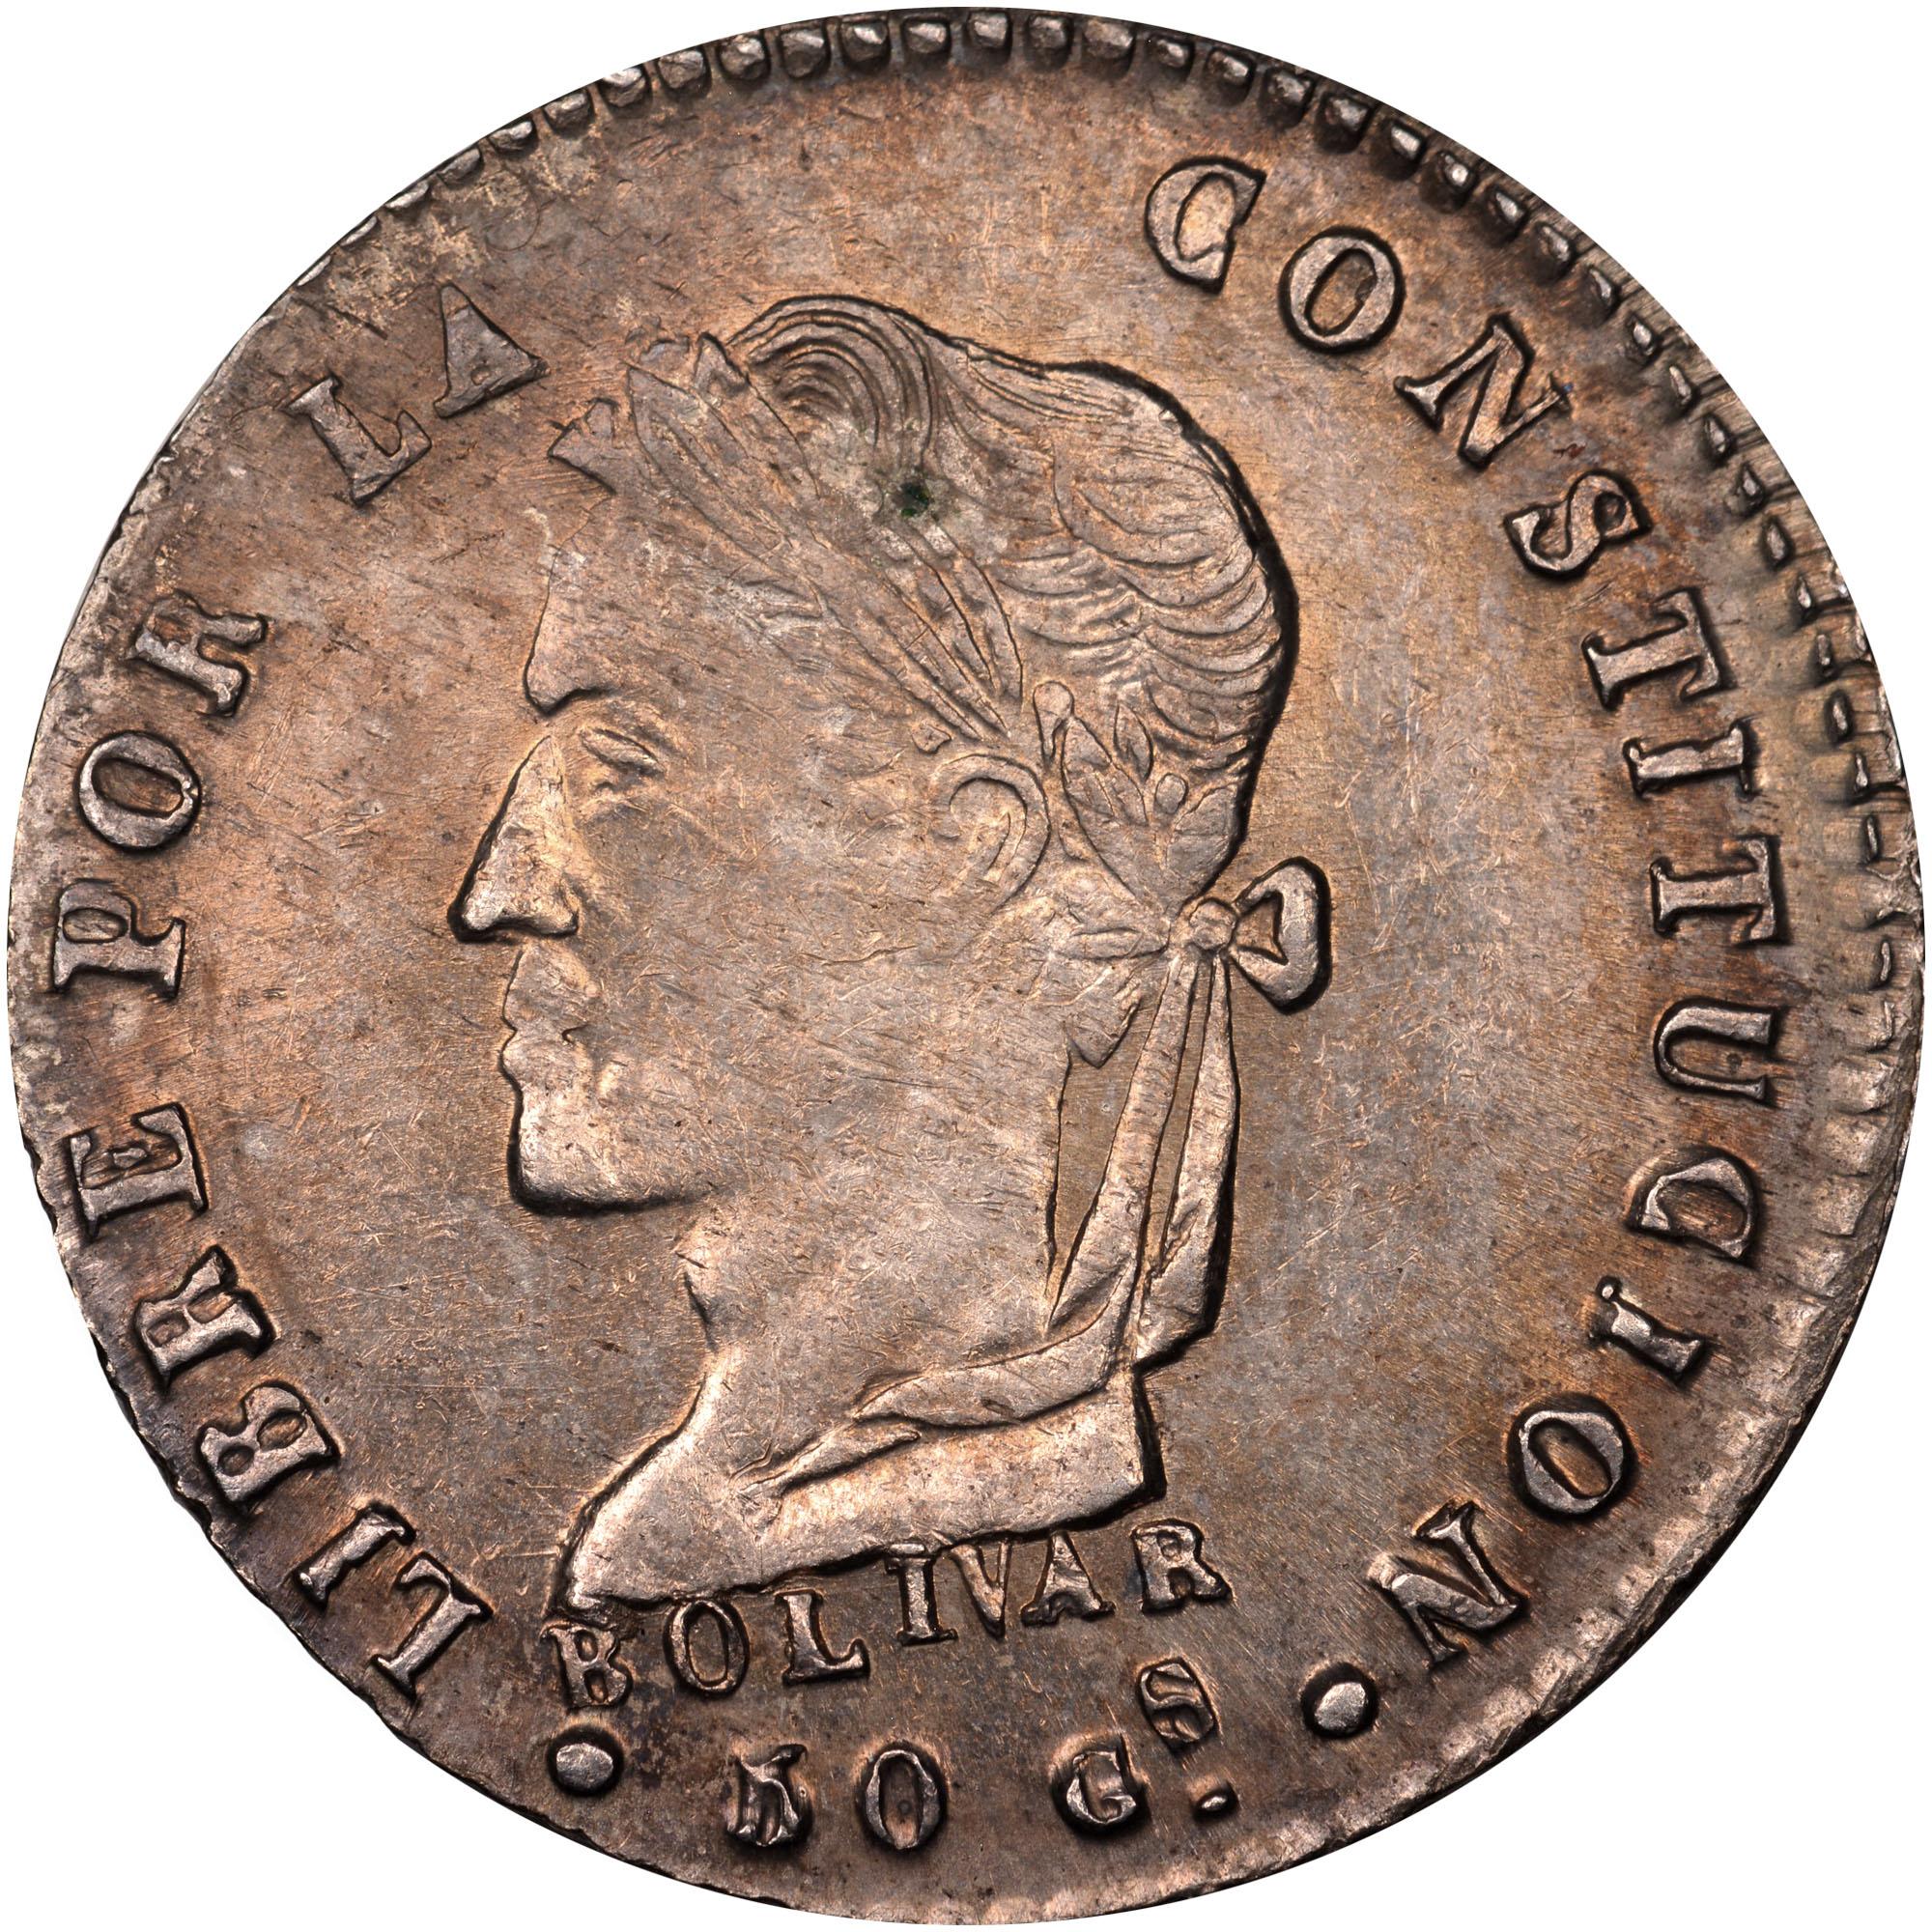 1860-1863/2 Bolivia Sol reverse